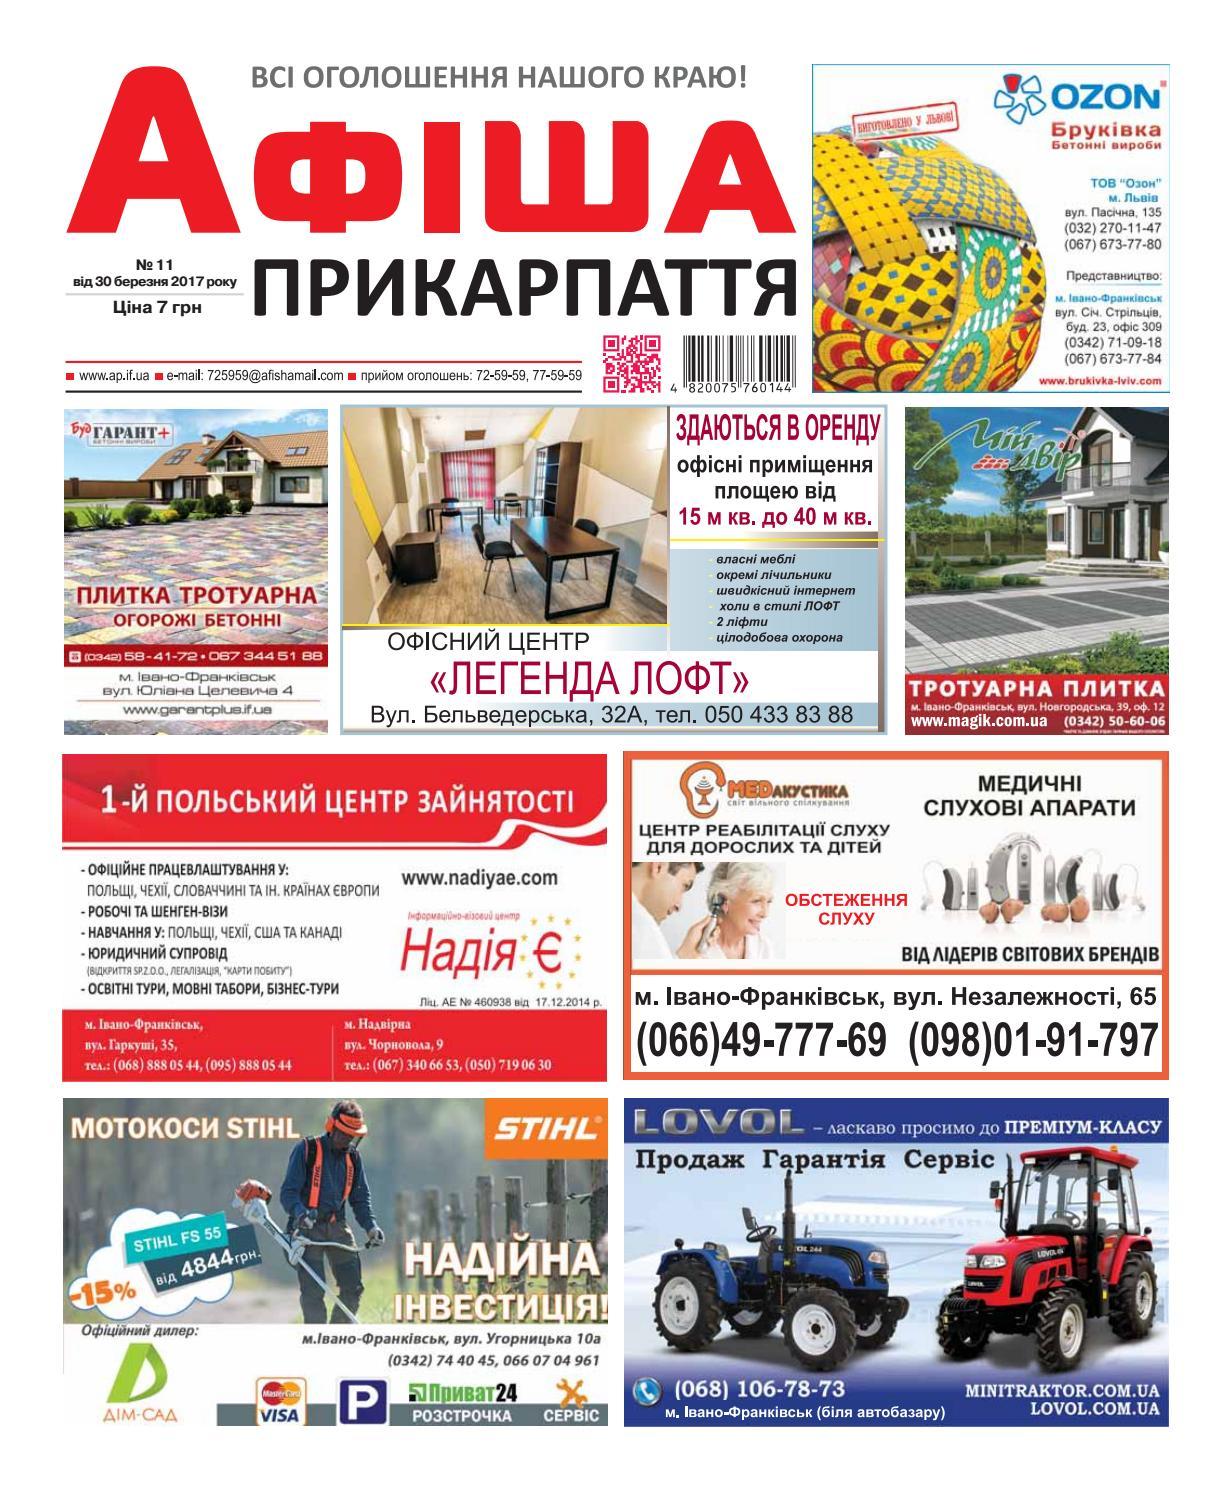 Афіша Прикарпаття 11 by Olya Olya - issuu 913fa56b1e056